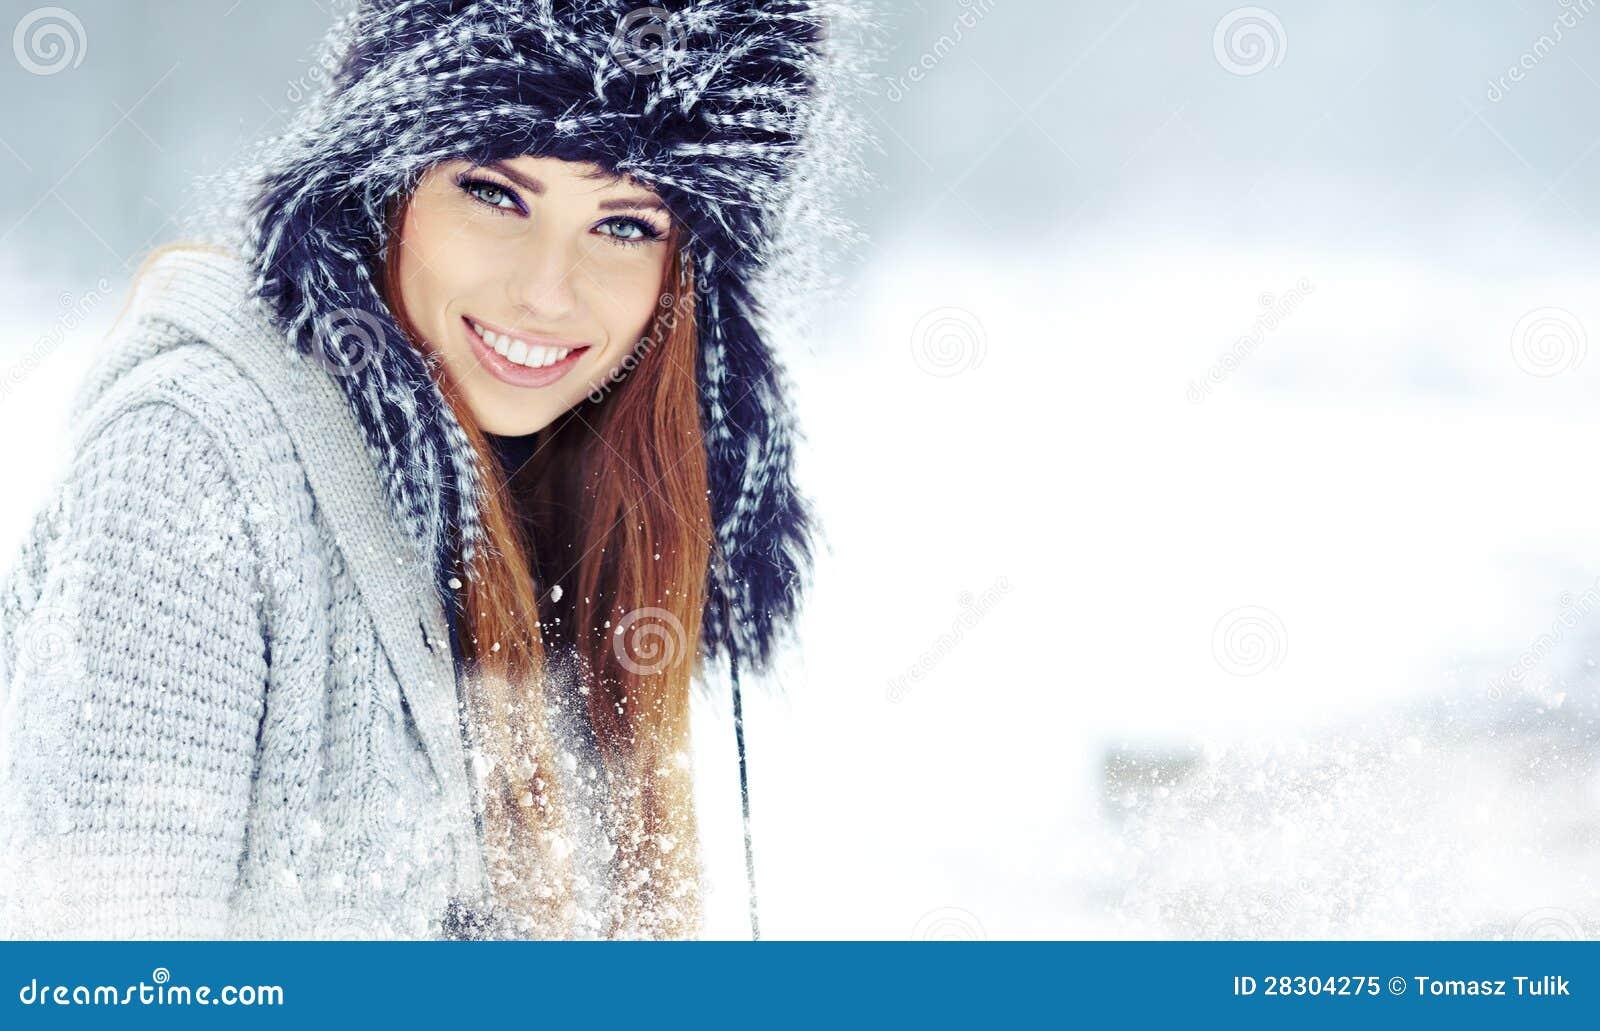 Woman winter portrait. Shallow dof.